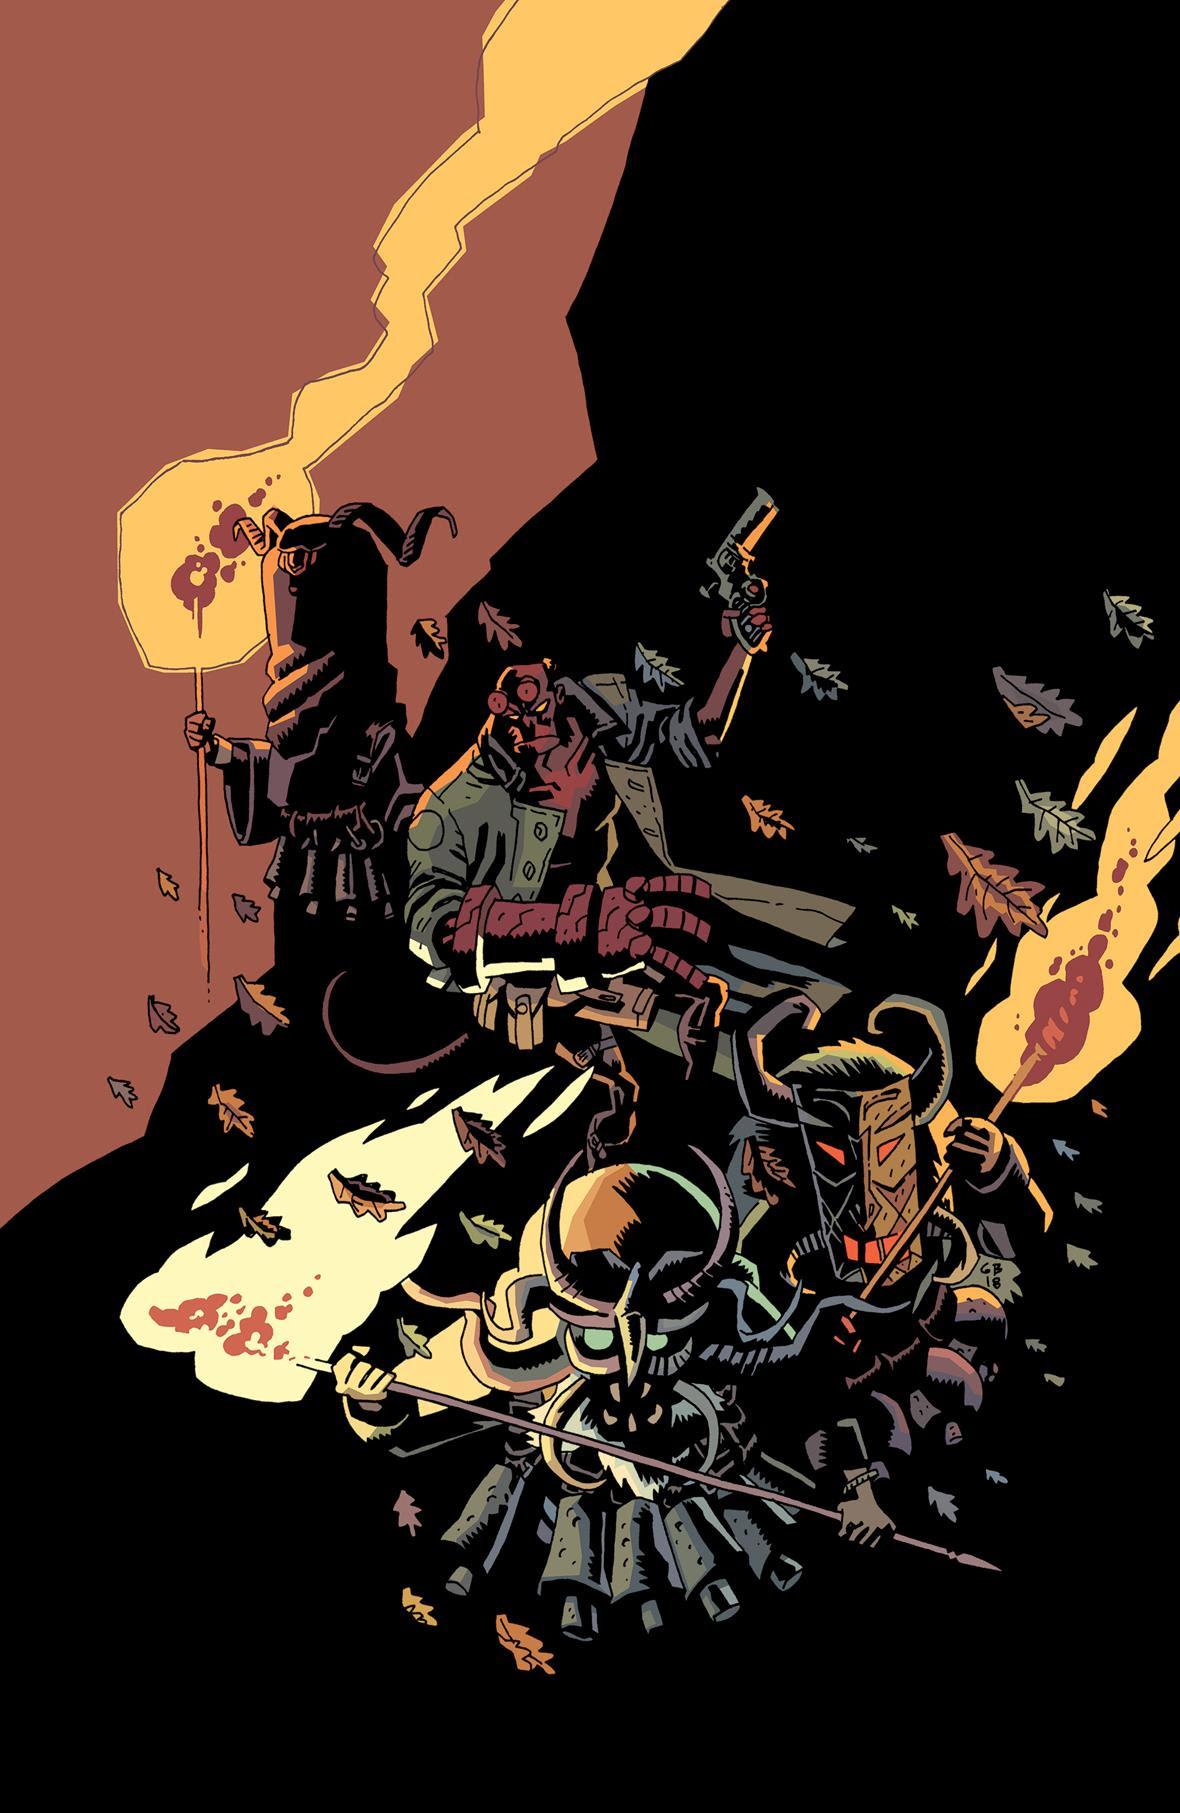 Hellboy Winter Special 2018 cover by Gabriel Bá